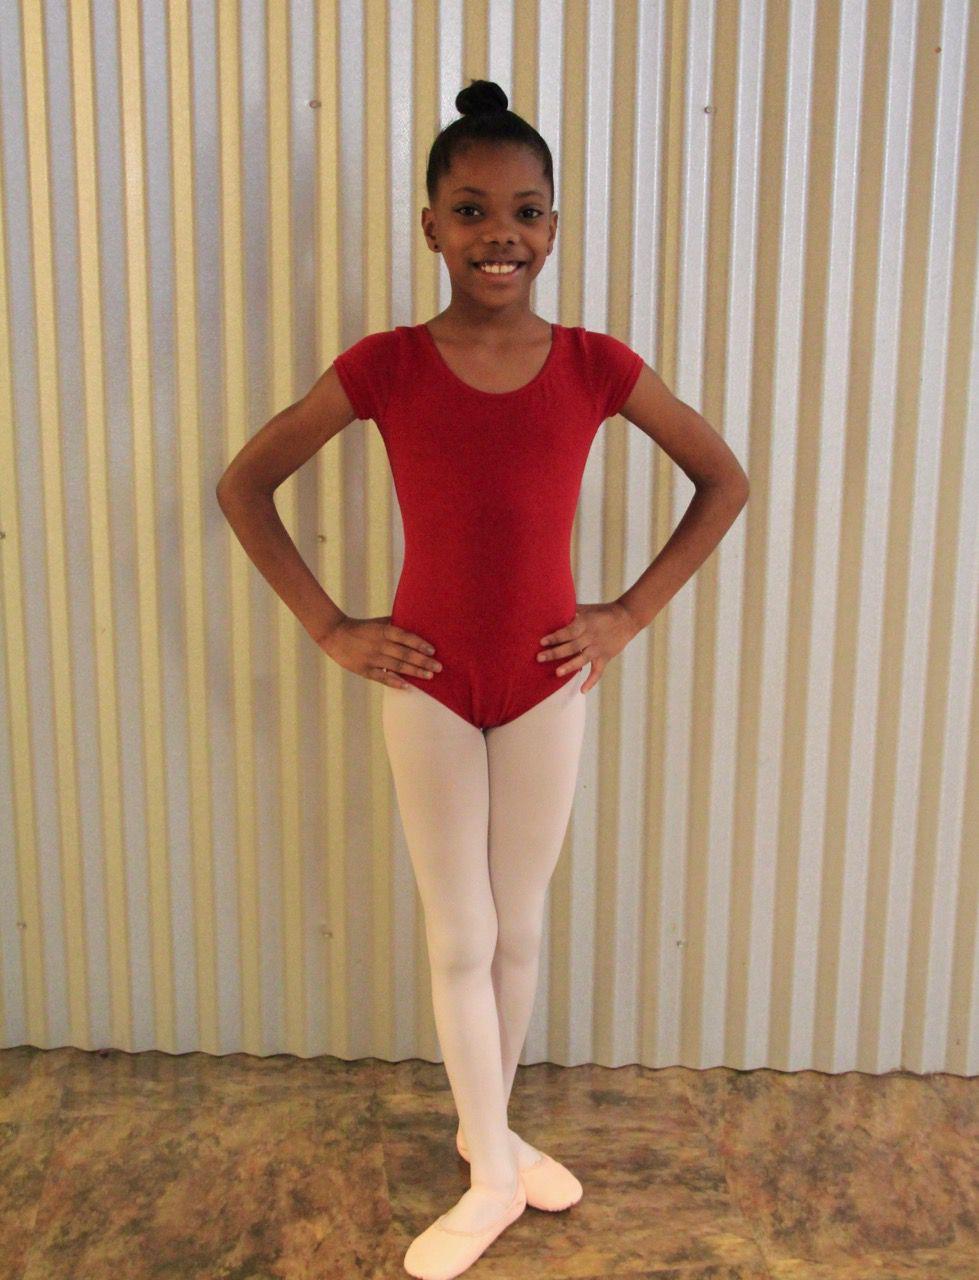 Ten-year-old Briana Davis is among 40 students receiving dance instruction at Dunbar Elementary School.